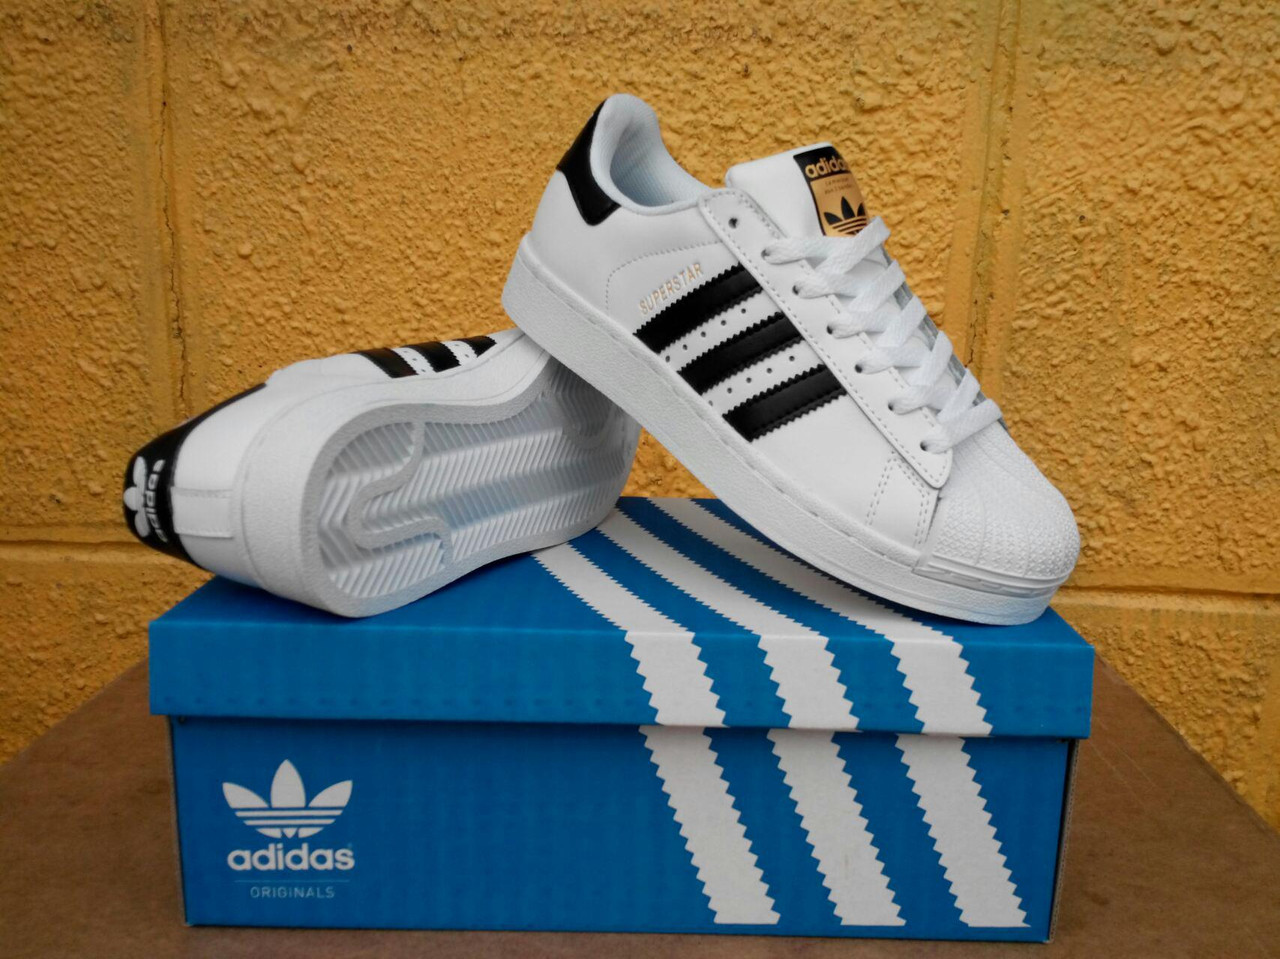 7e10fc13d3c8bb Кроссовки Adidas Superstar Supercolor white black gold. Живое фото.  Самовывоз (Реплика